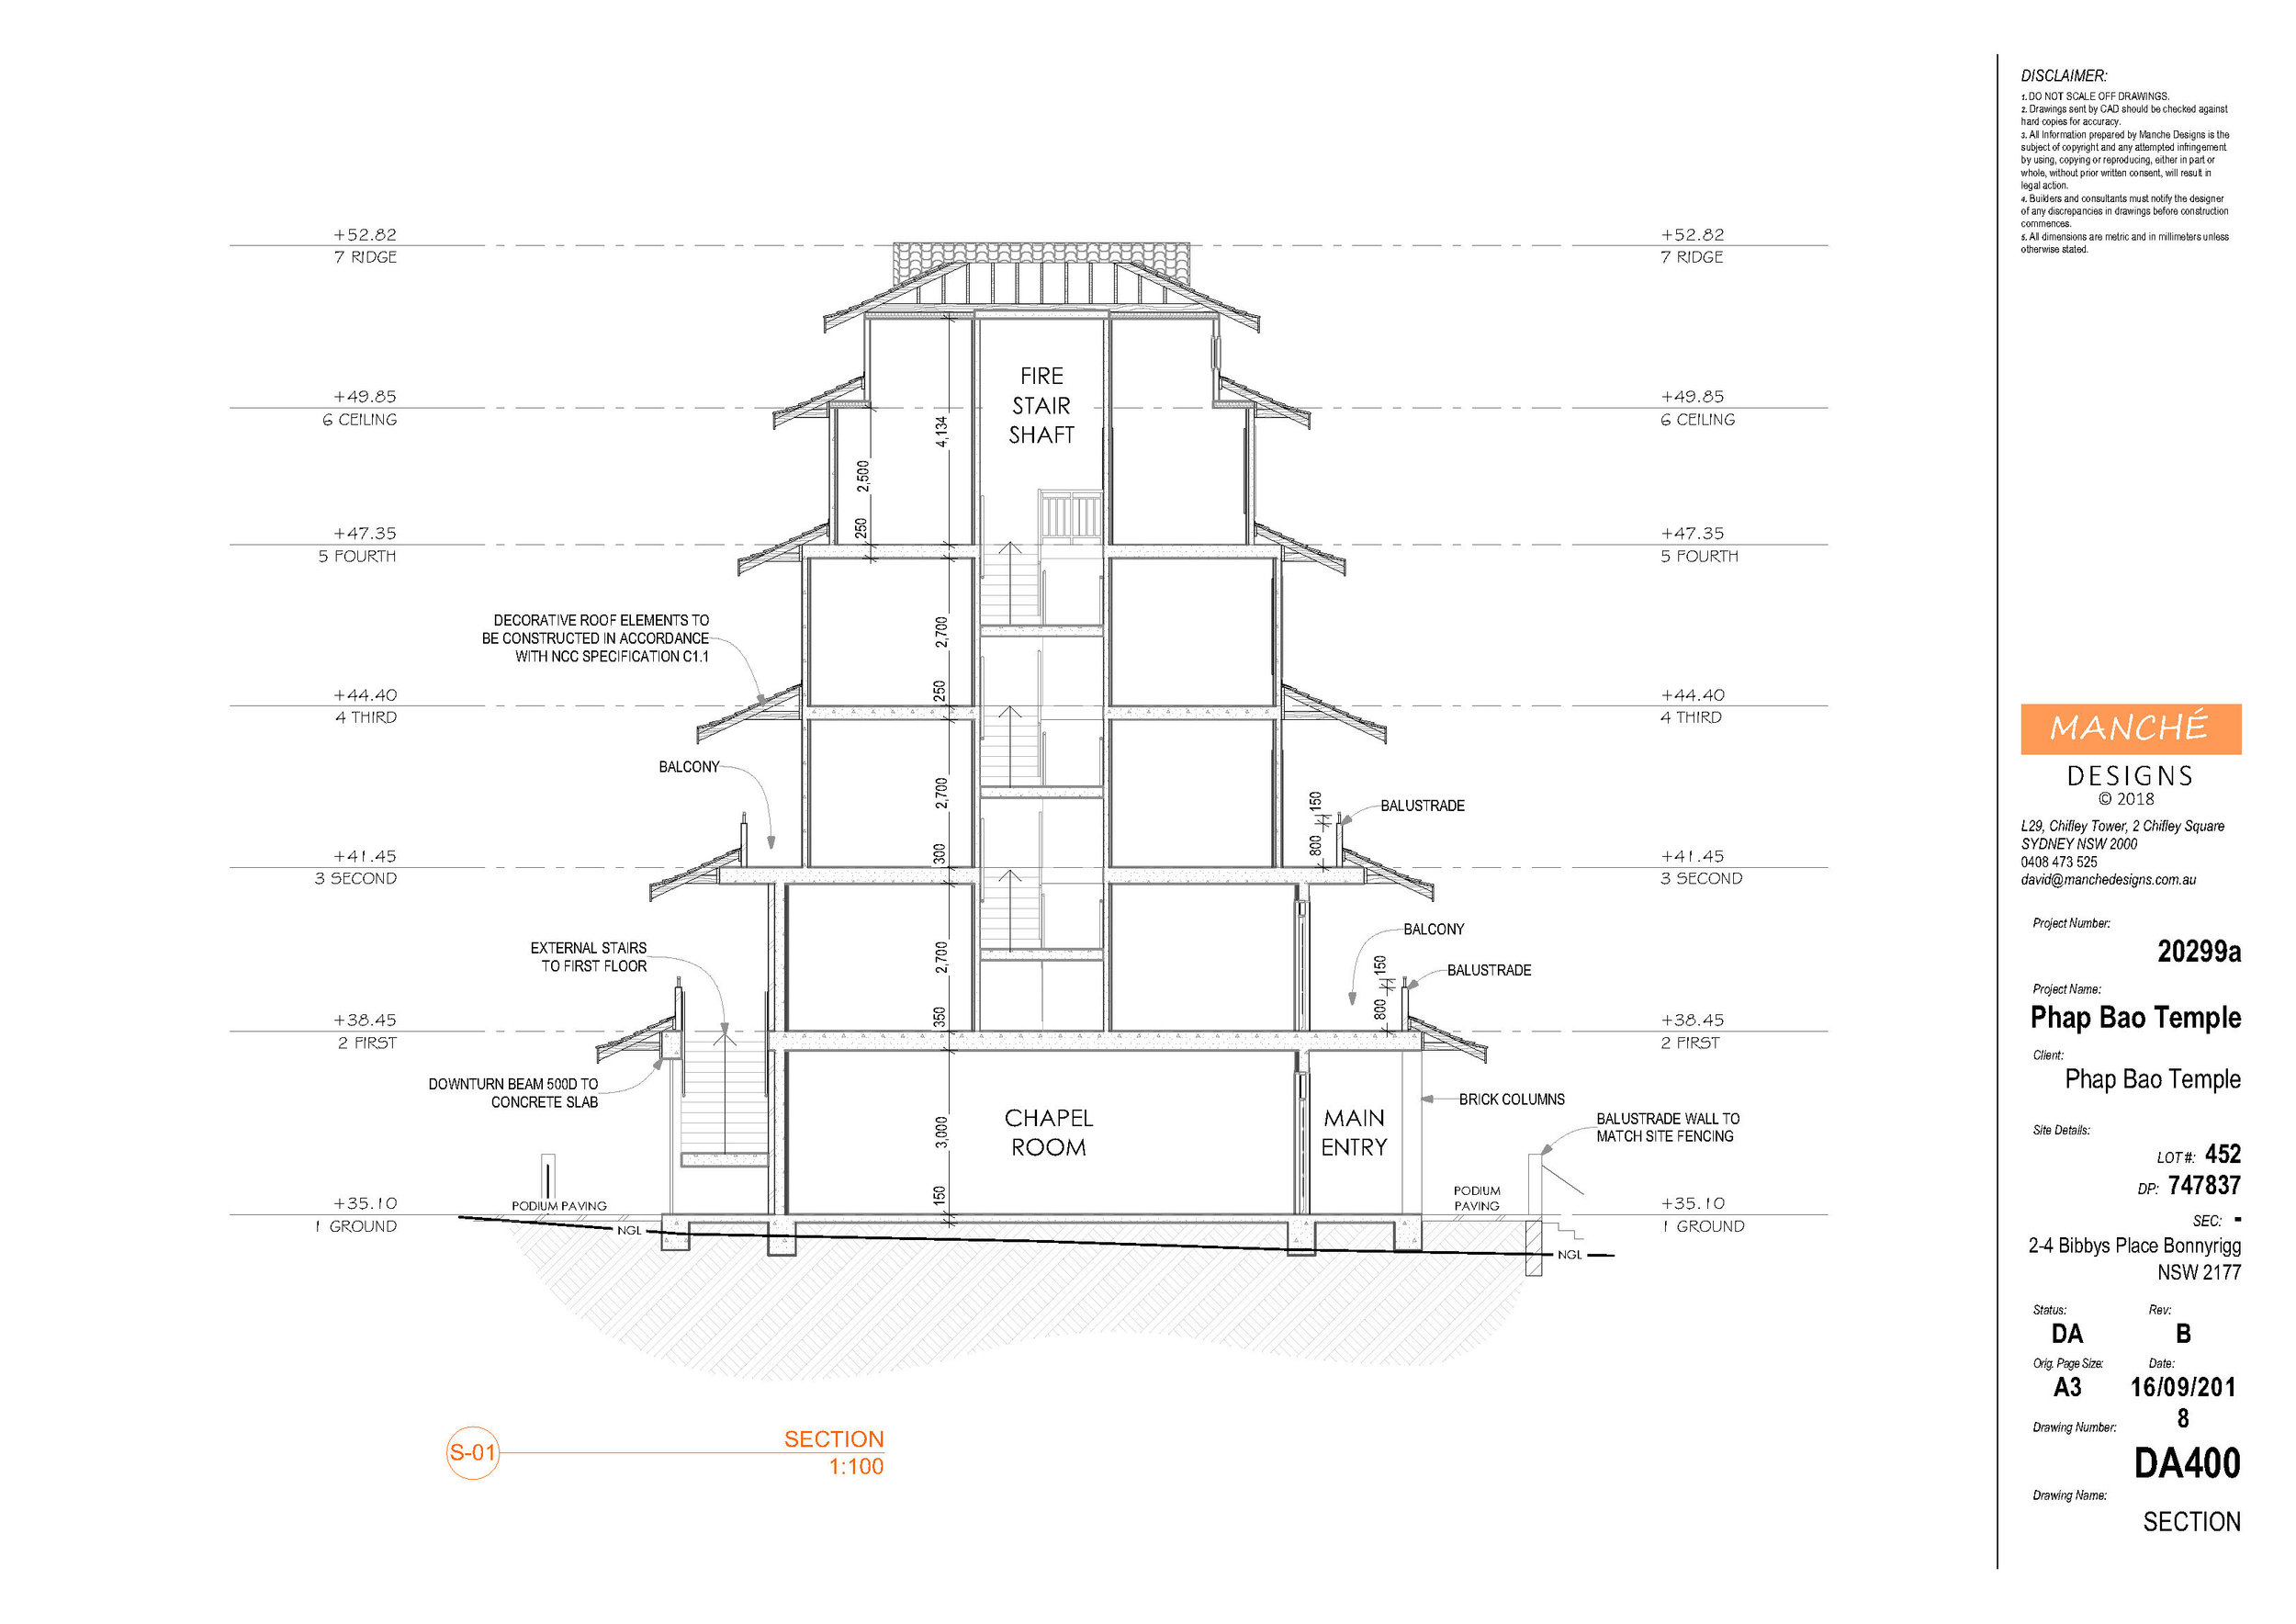 Phap Bao Temple - DA - Rev B Final-P1_Page_19.jpg